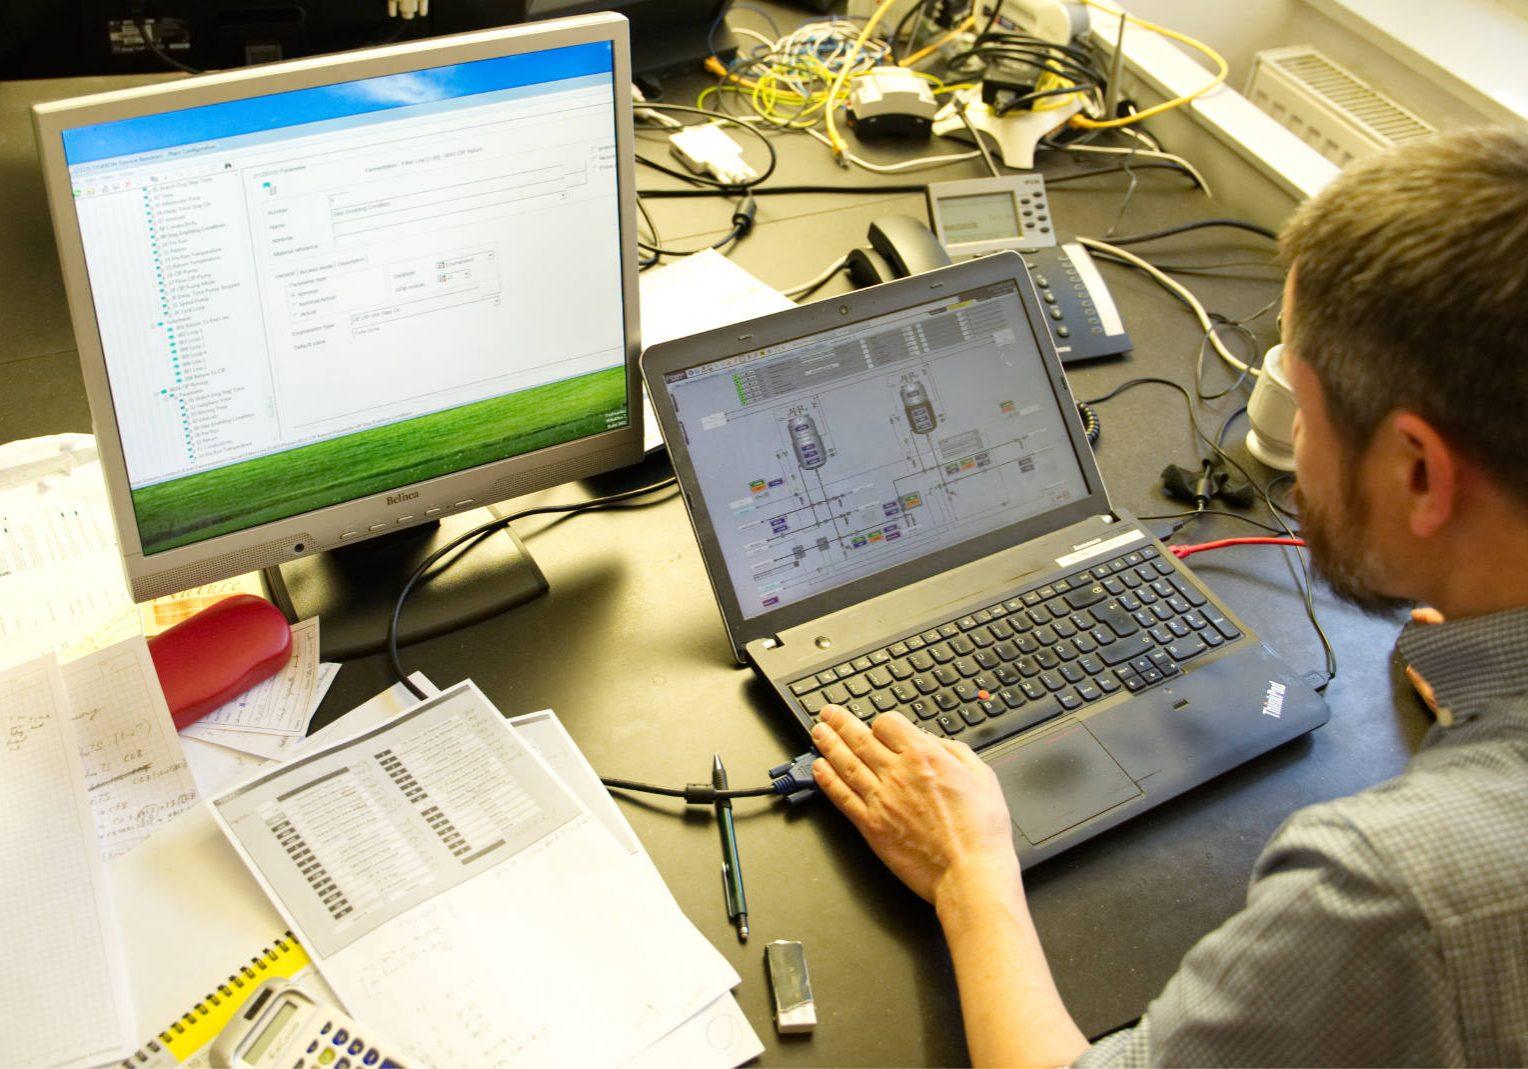 VAT-Unterberger-GmbH